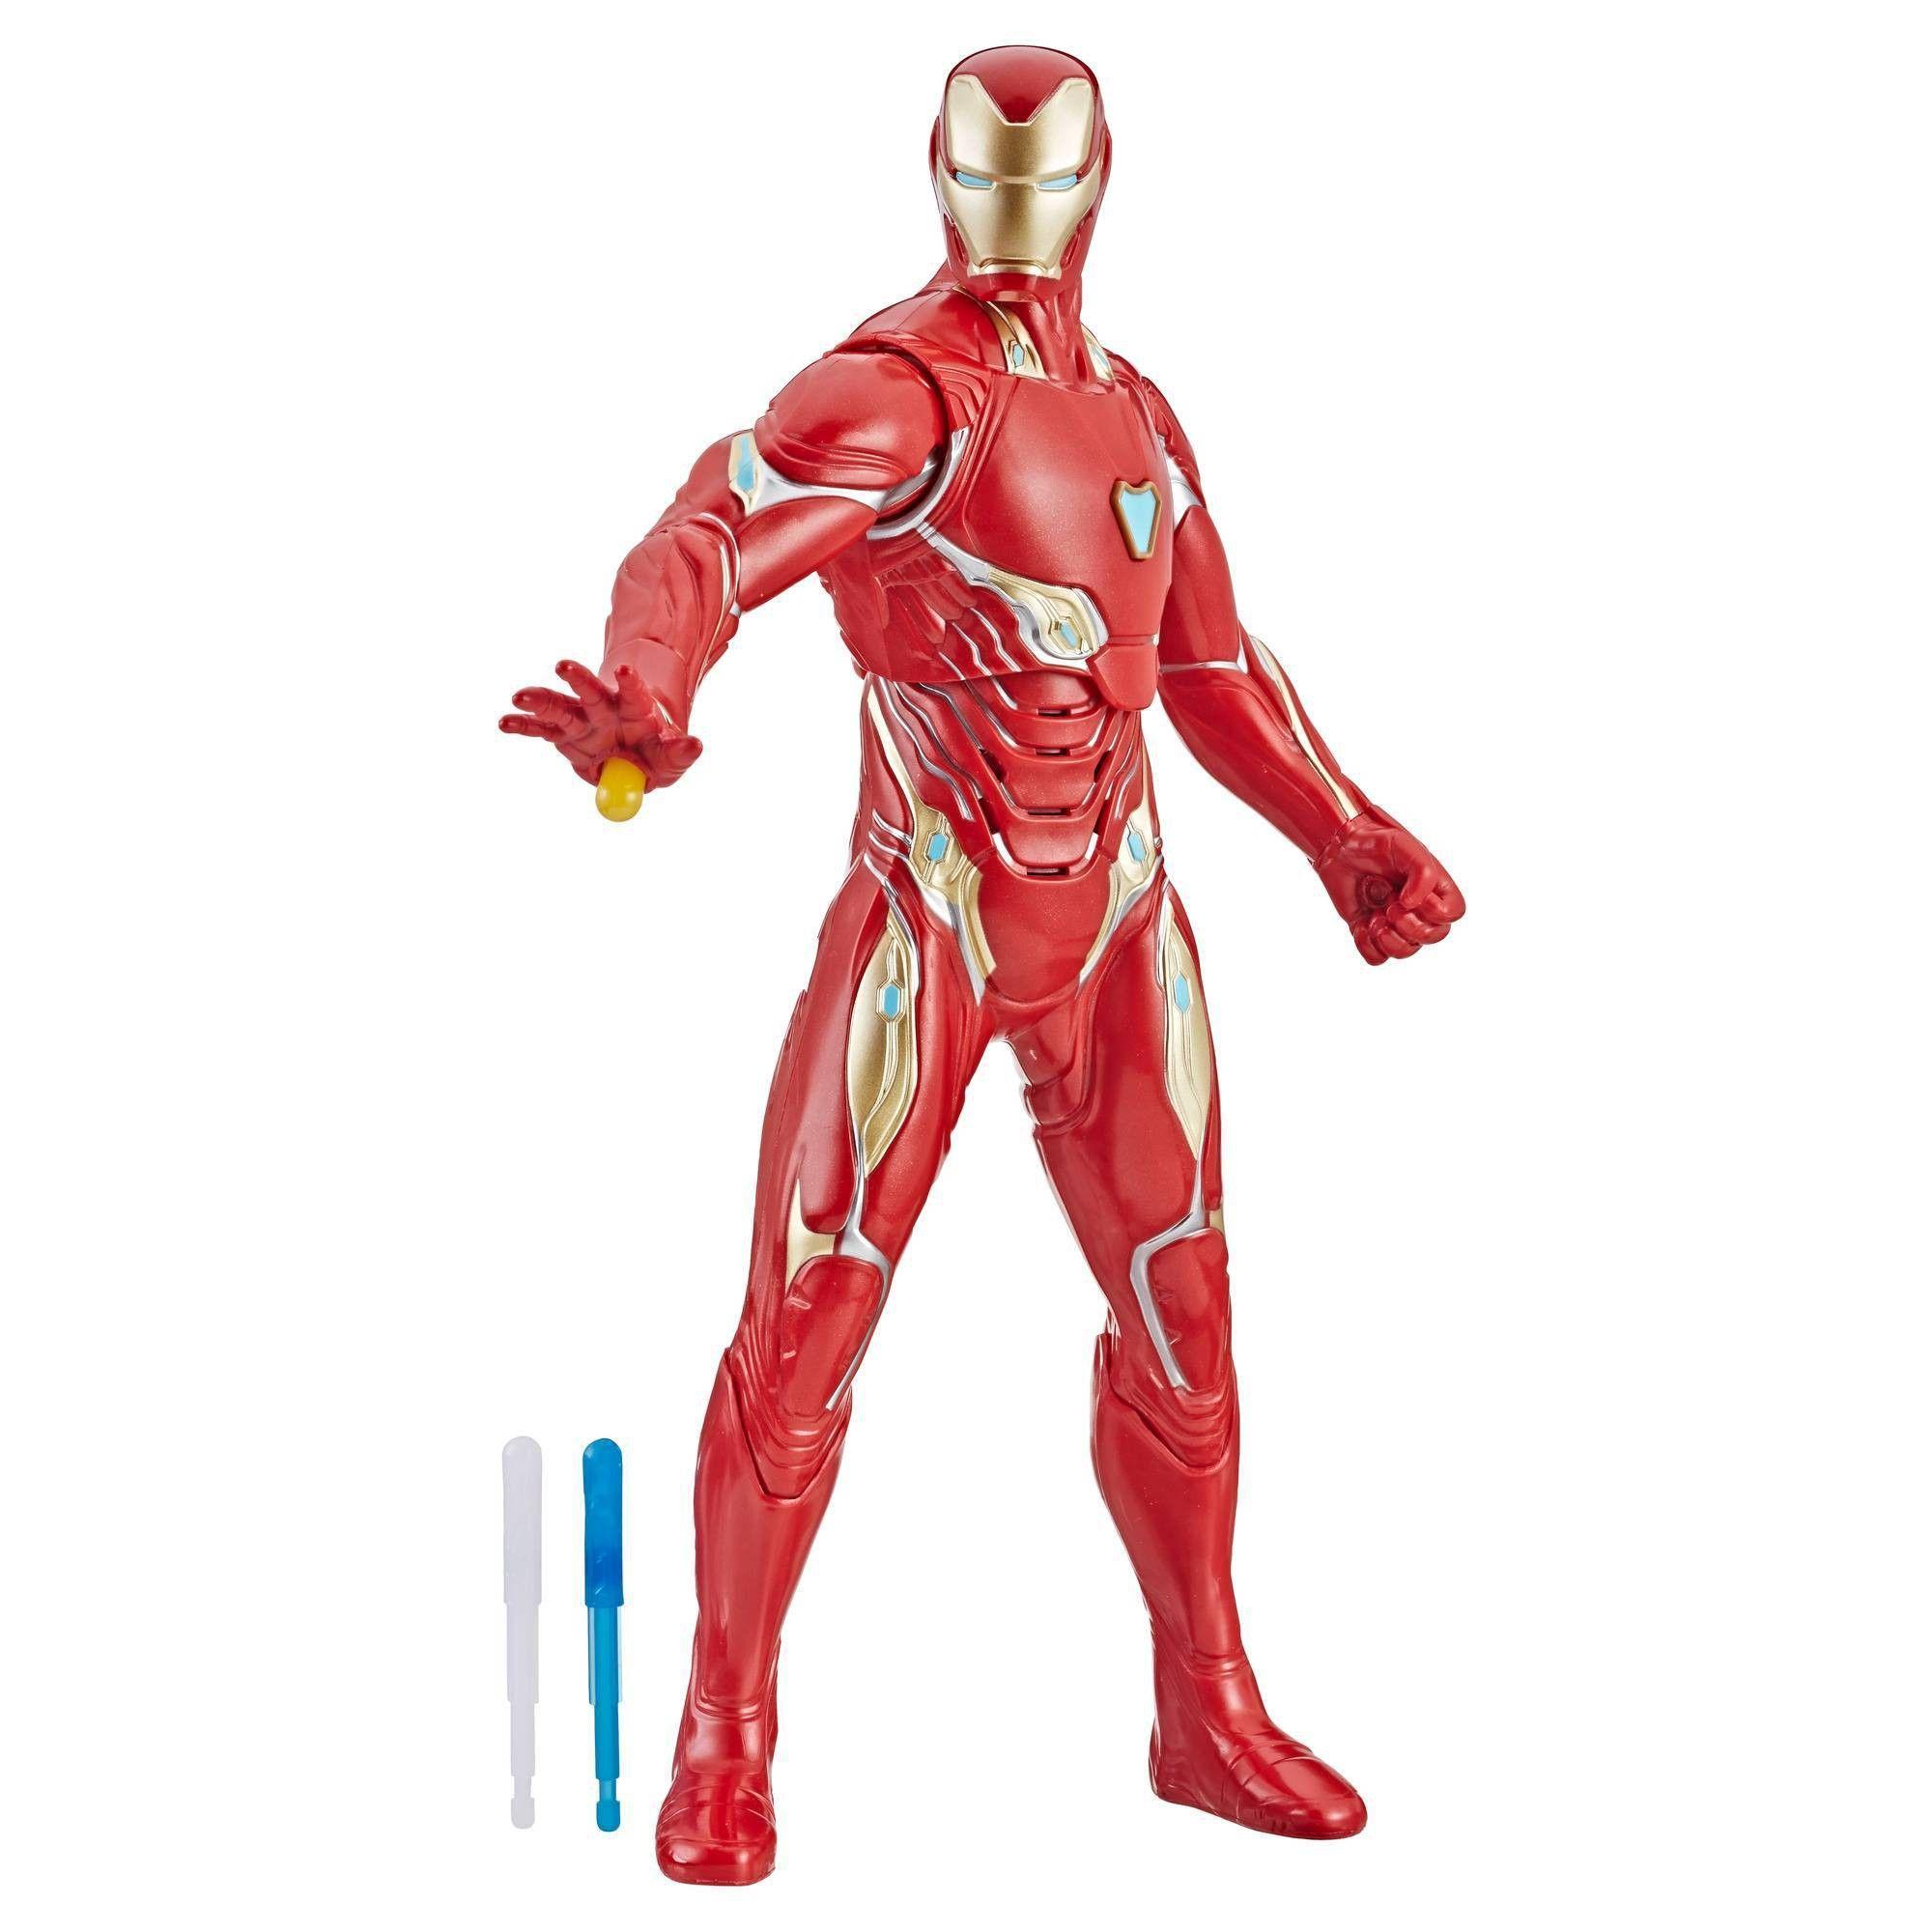 a174bd6628 Marvel Avengers: Endgame Repulsor Blast Iron Man 13